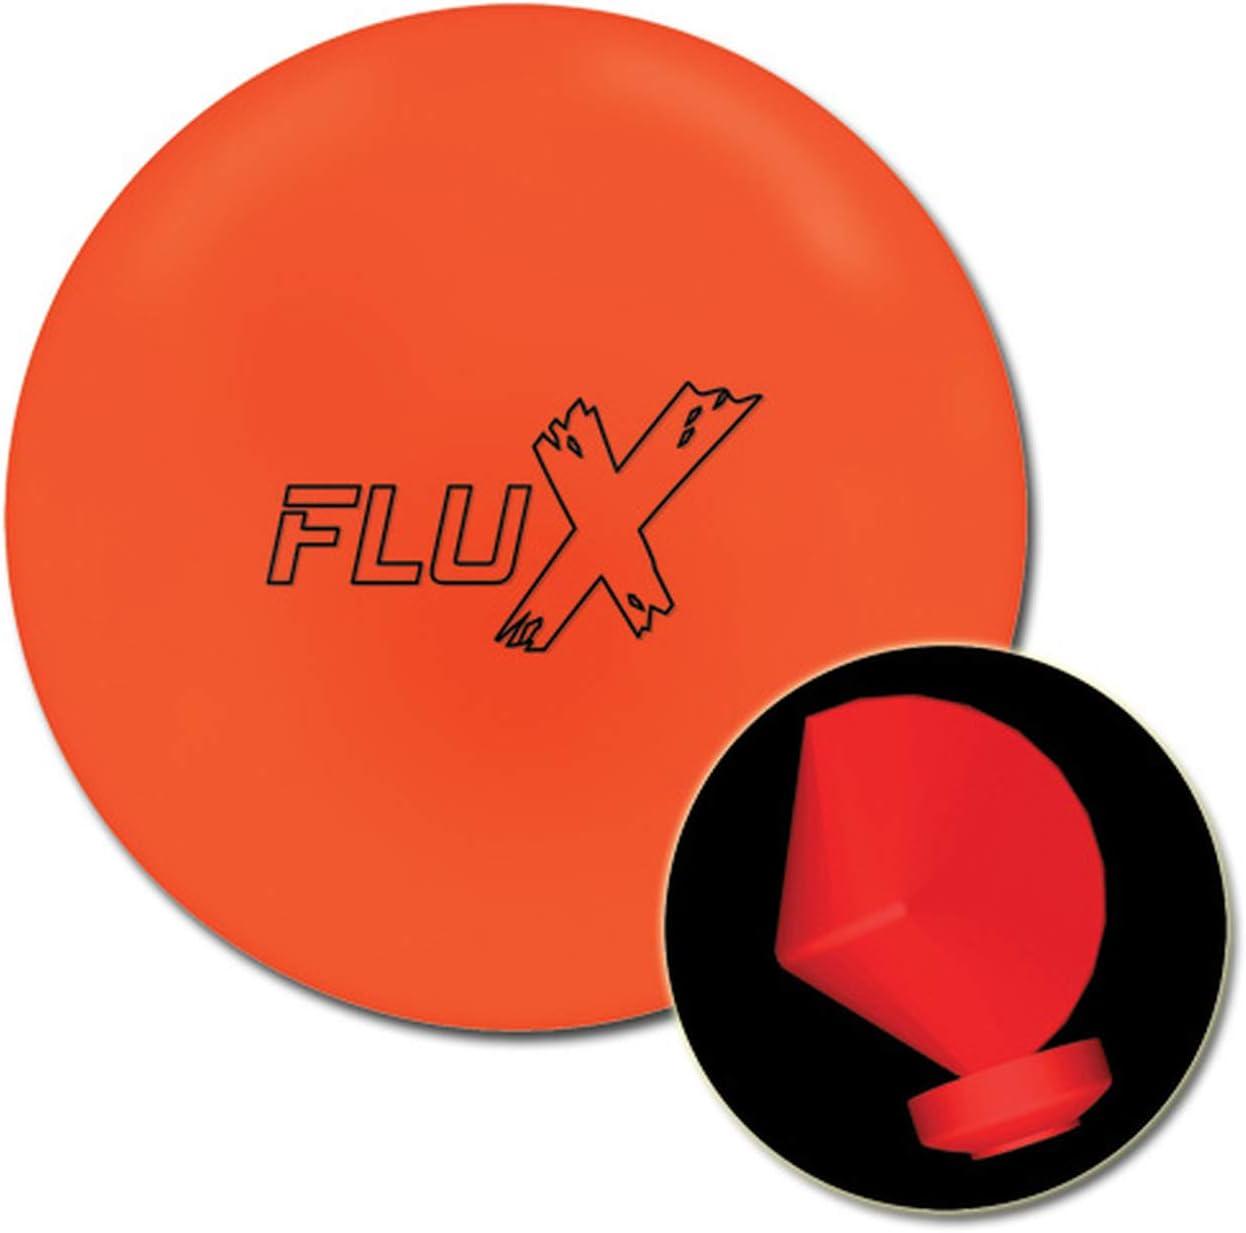 Orange Pearl 15lbs 900 Global Flux Pearl Bowling Ball